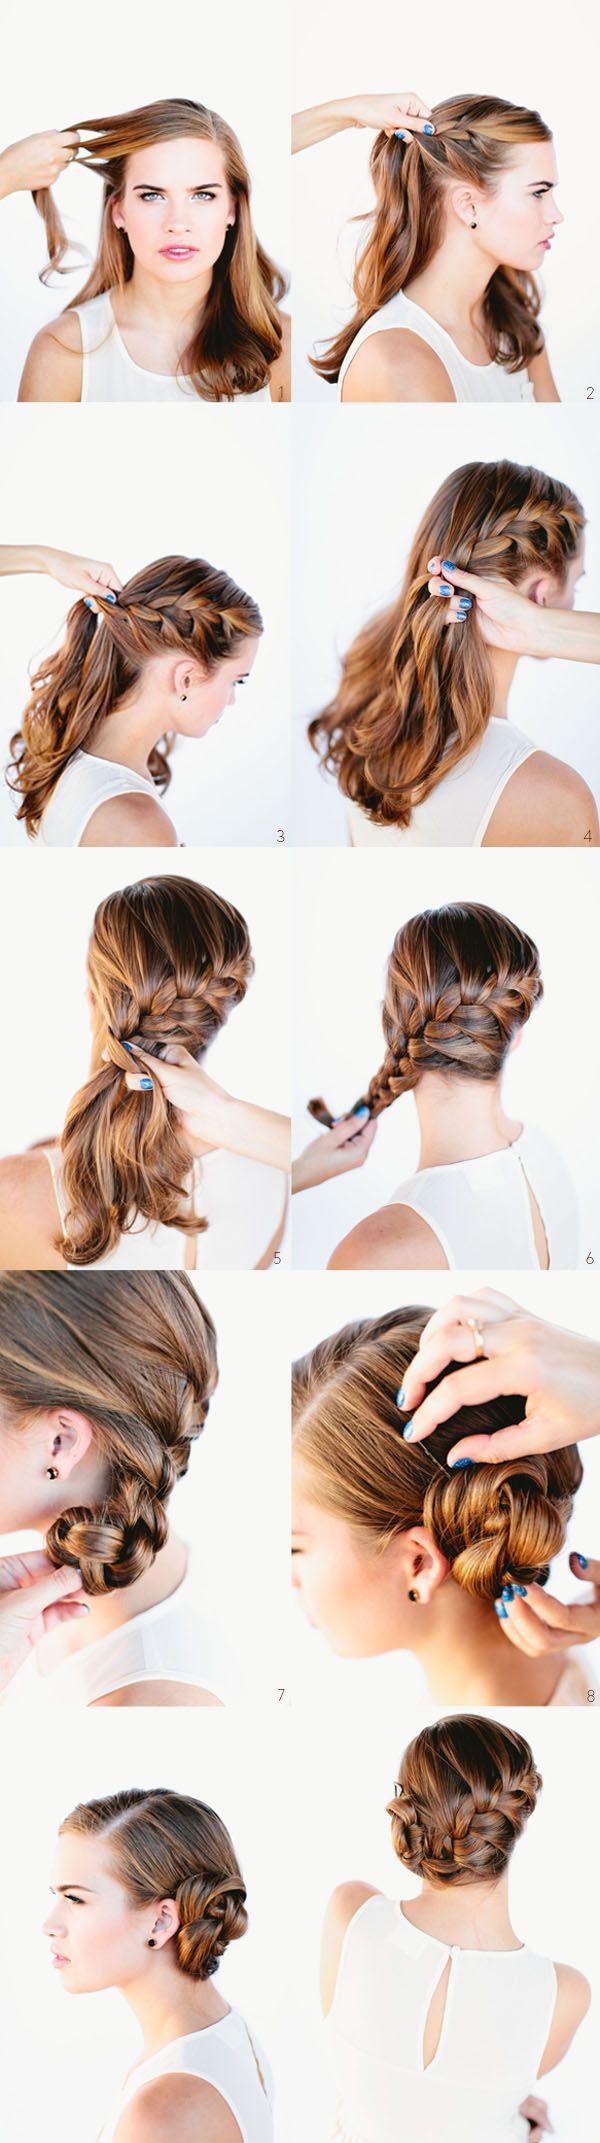 52 best Beauty Bored images on Pinterest | Gorgeous hair, Hair looks ...